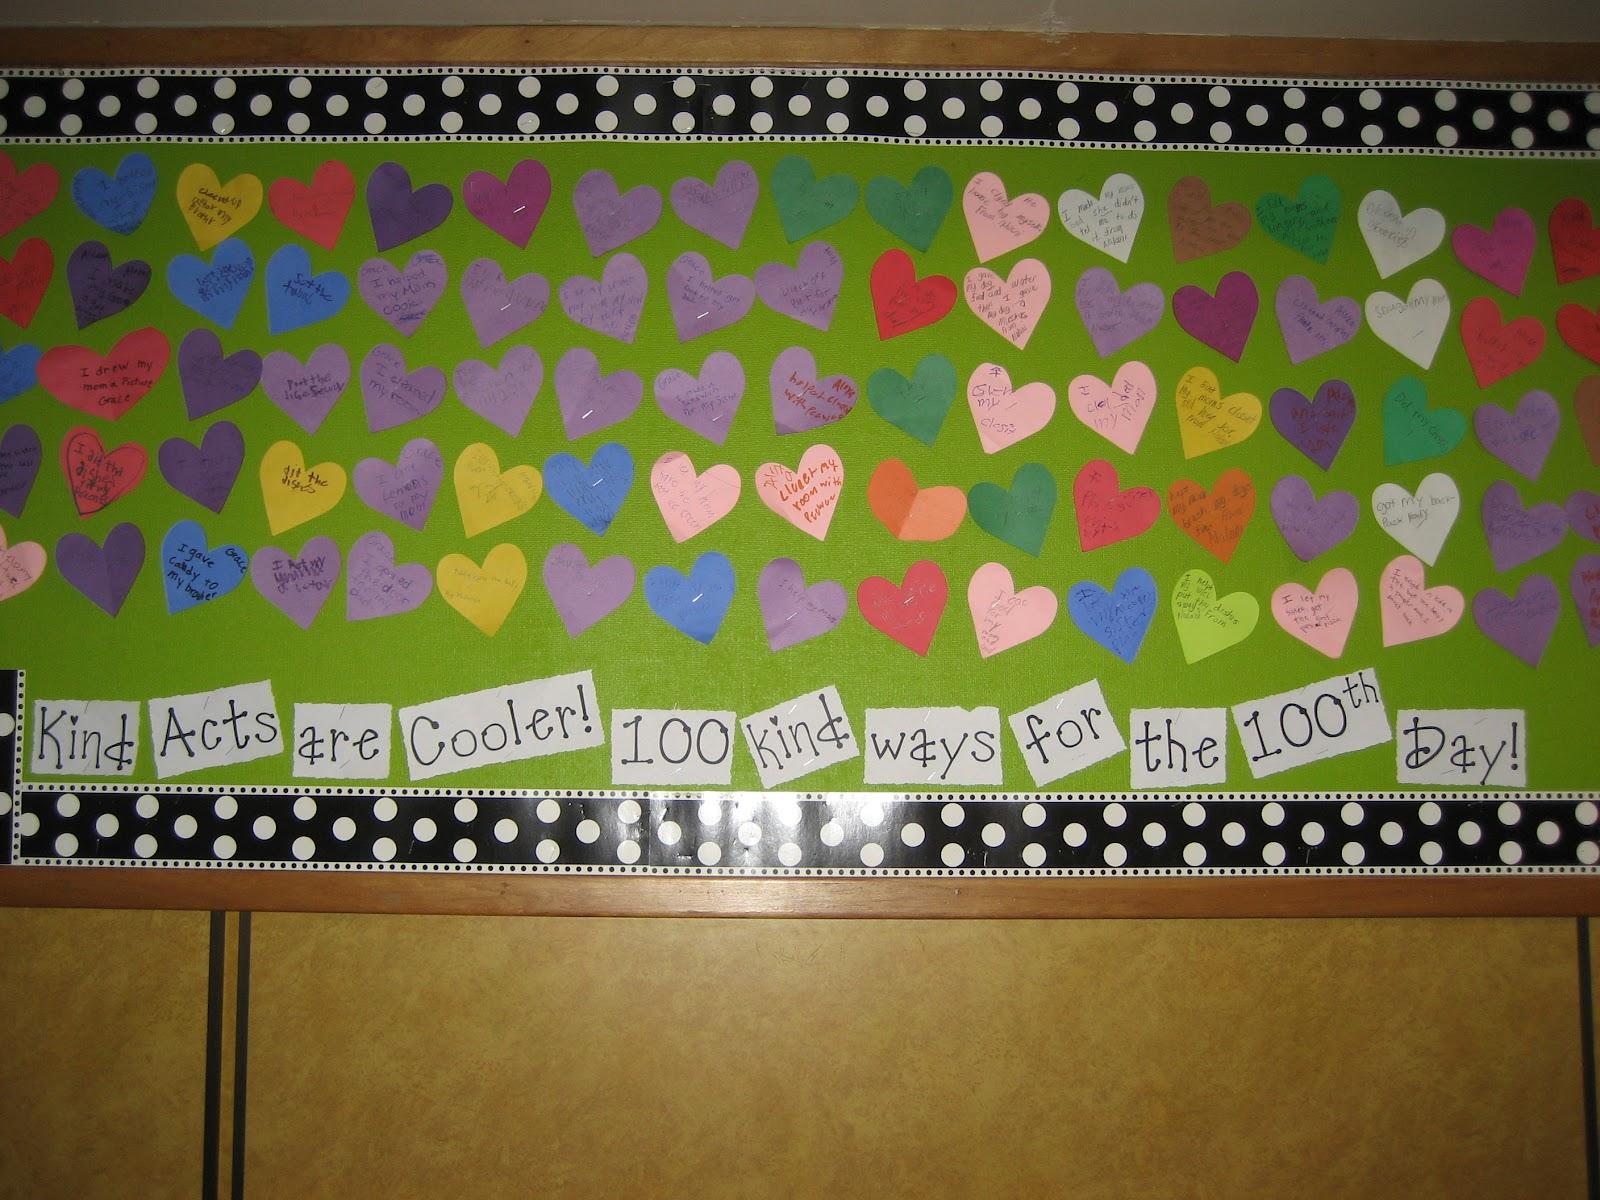 Fullsize Of School Poster Decoration Ideas